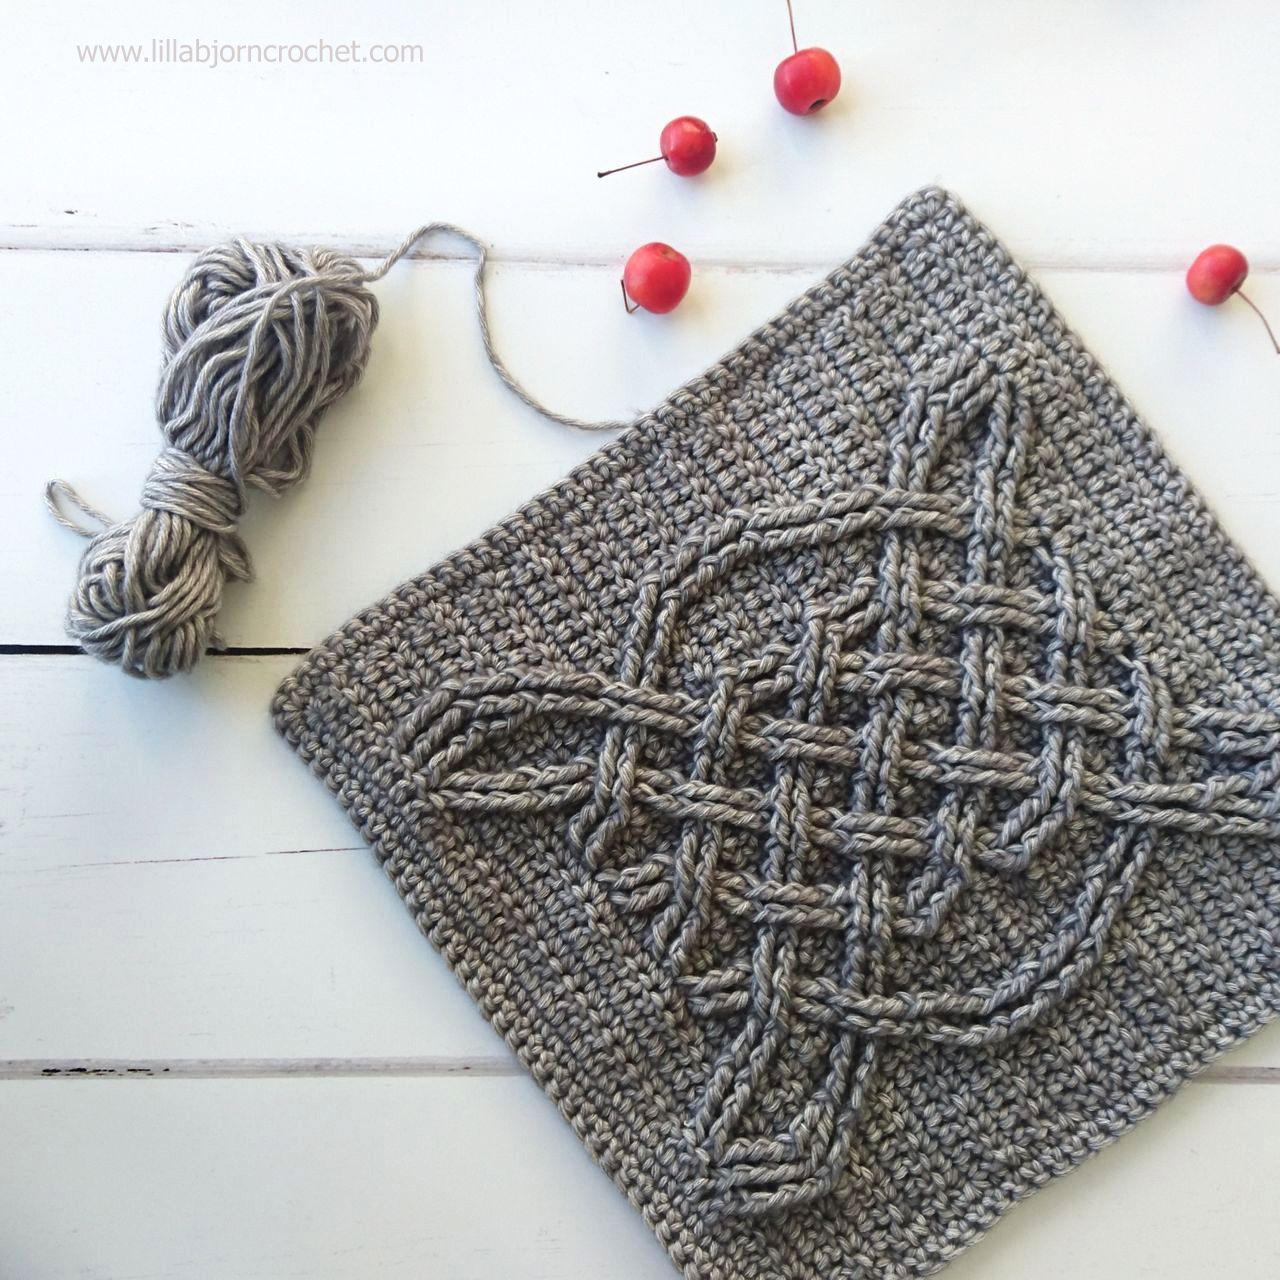 Celtic crochet square - free pattern by Lilla Bjorn | Crochet ...